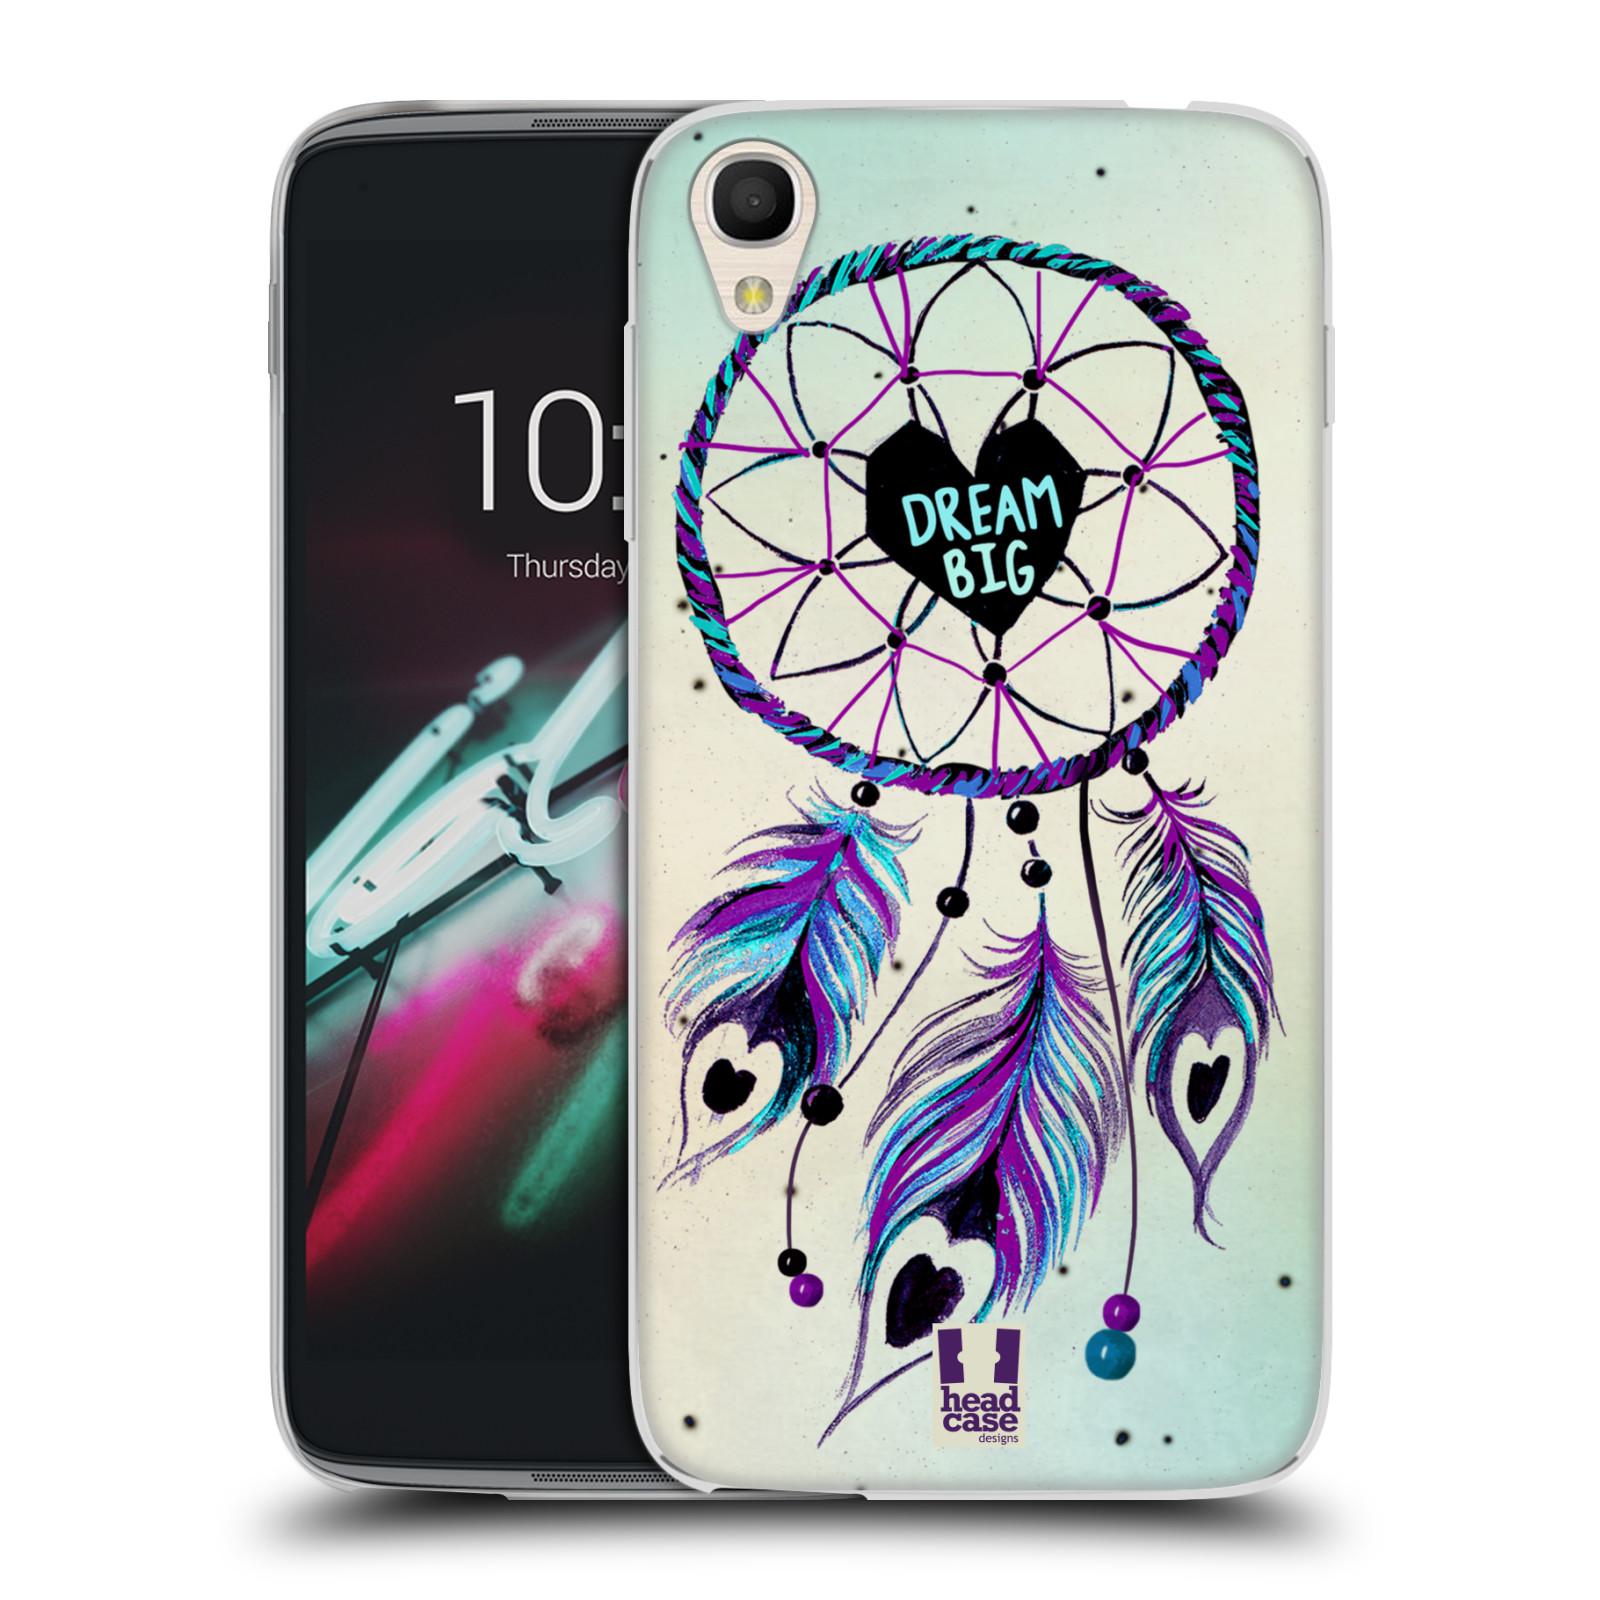 "Silikonové pouzdro na mobil Alcatel One Touch 6039Y Idol 3 HEAD CASE Lapač Assorted Dream Big Srdce (Silikonový kryt či obal na mobilní telefon Alcatel One Touch Idol 3 OT-6039Y s 4,7"" displejem)"